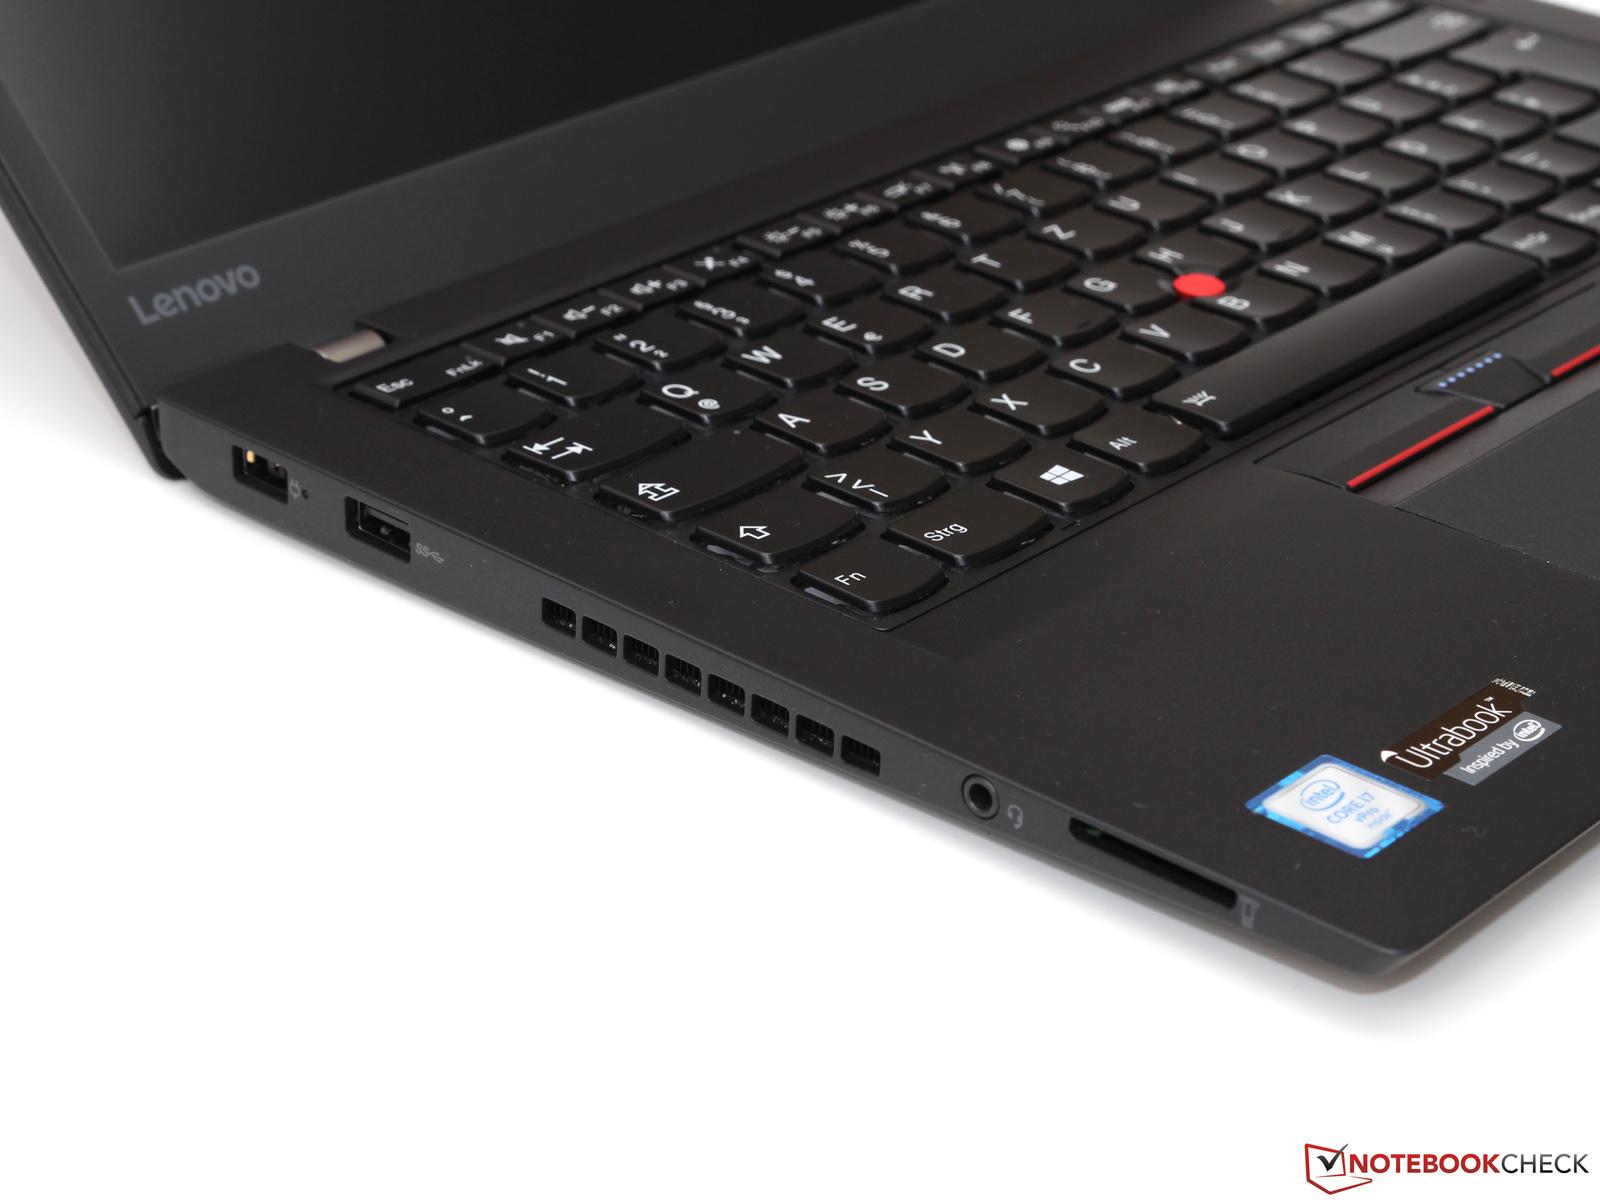 Lenovo ThinkPad T460s Long-Term Review: Part 2 - Wireless Docks and Terabyte SSDs